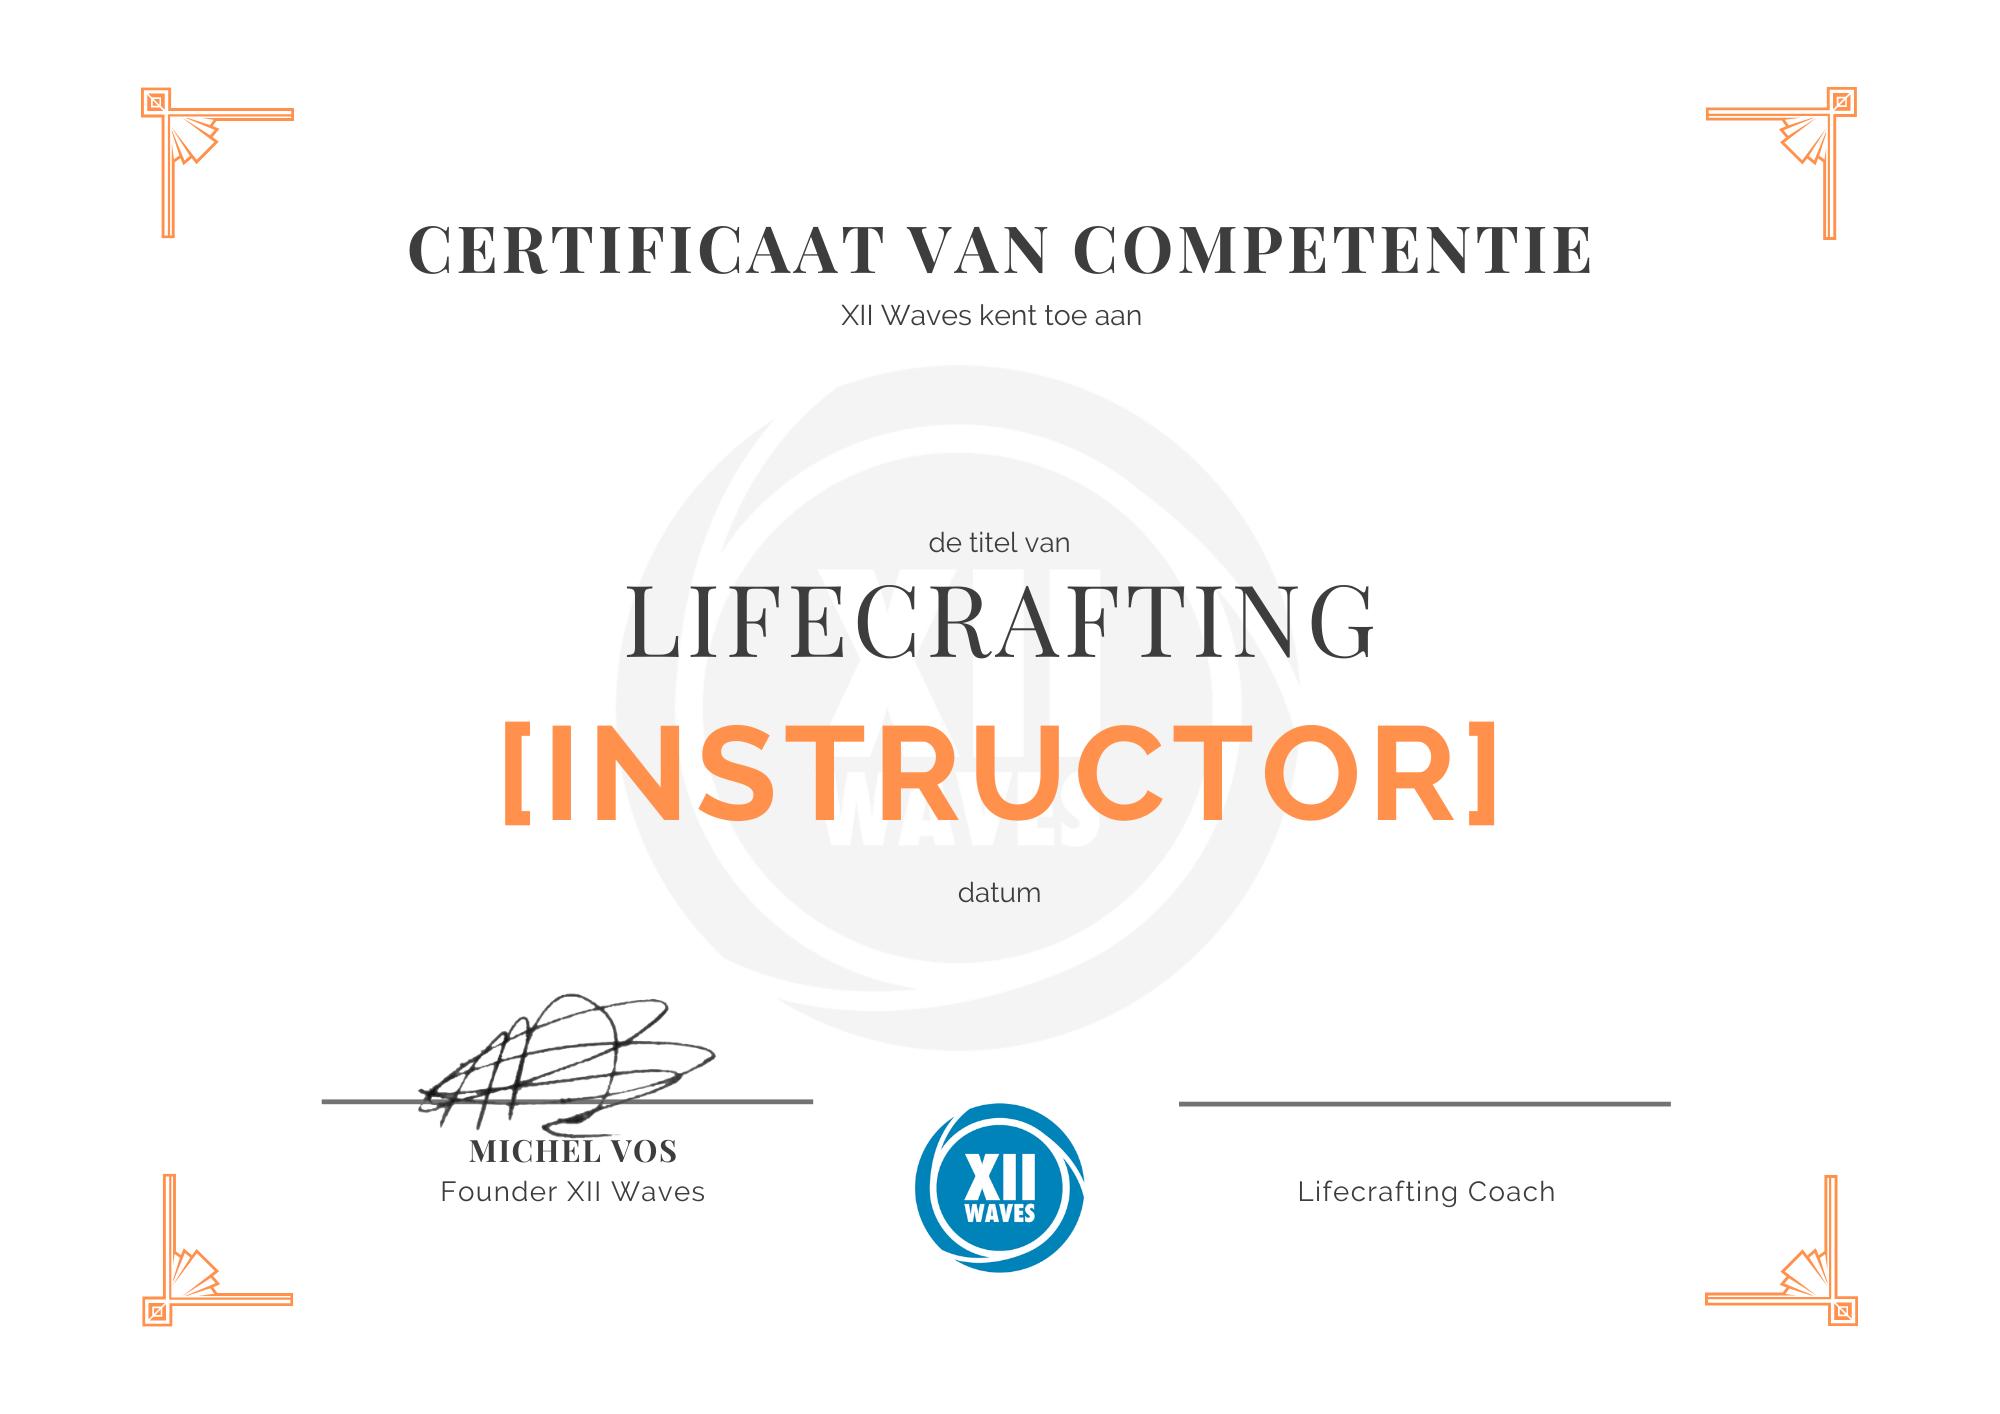 llifecrafting instructor